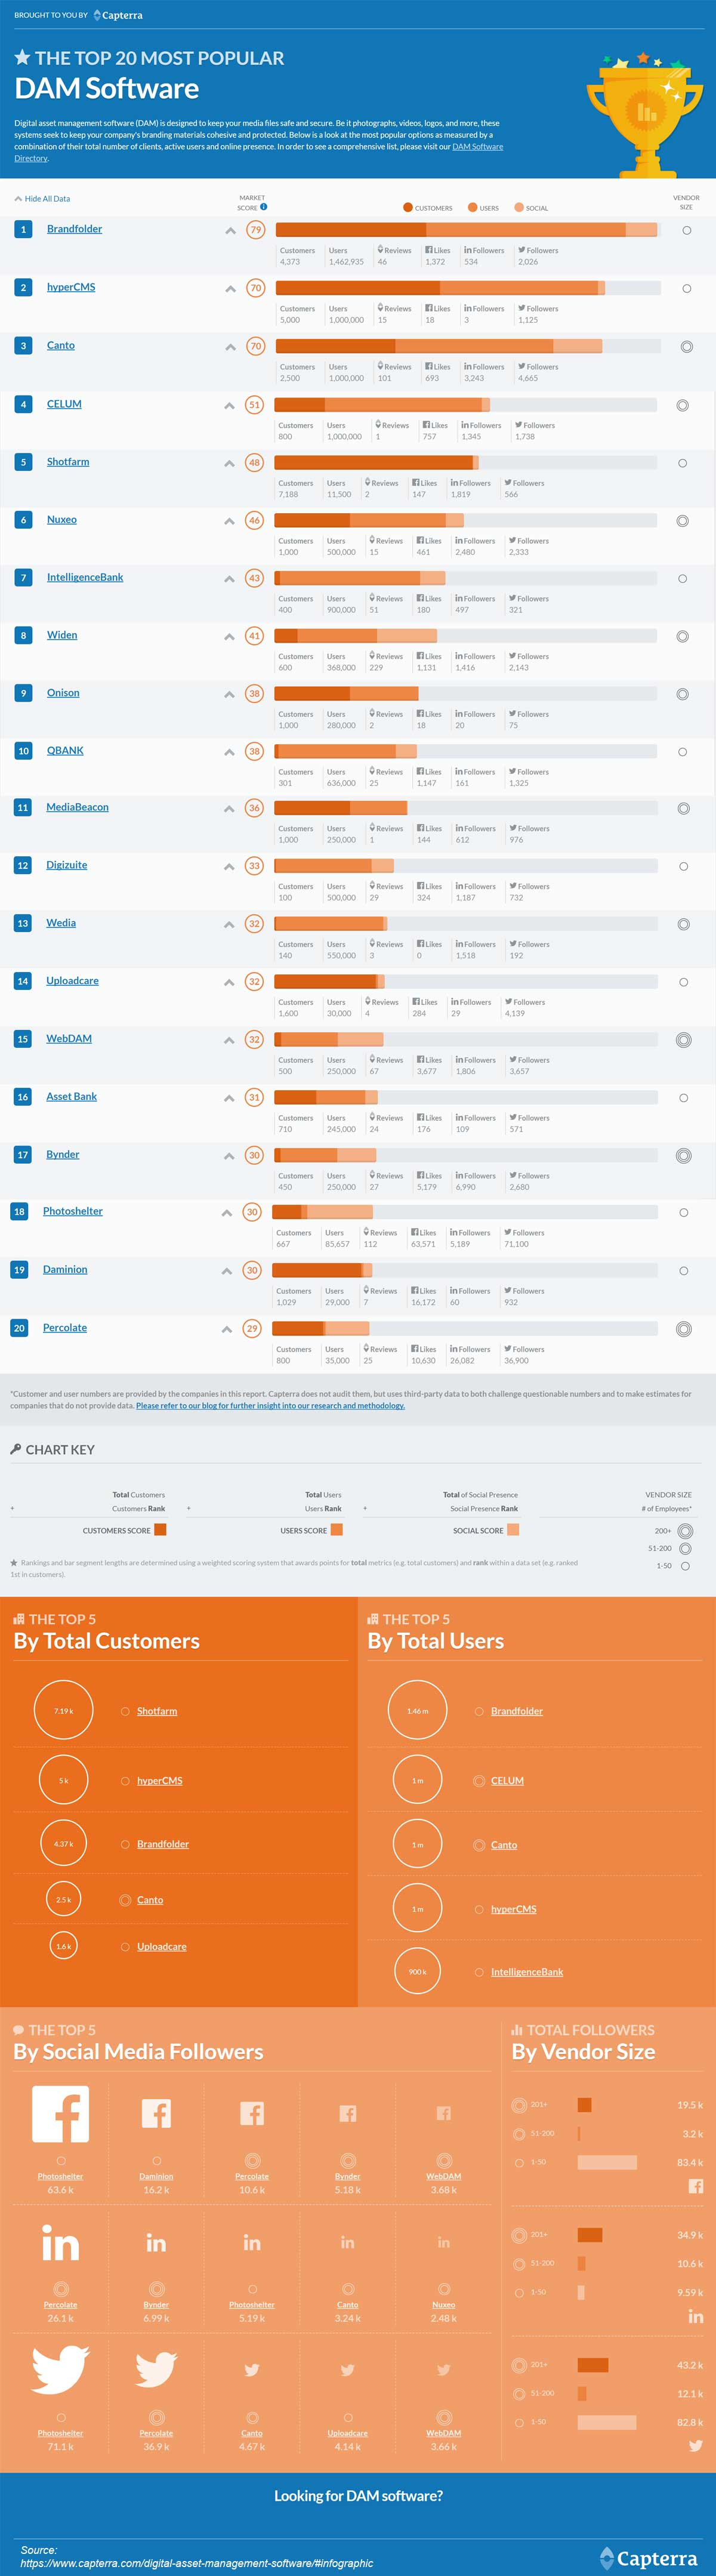 THE TOP 20 MOST POPULAR Digital Asset Management Solutions